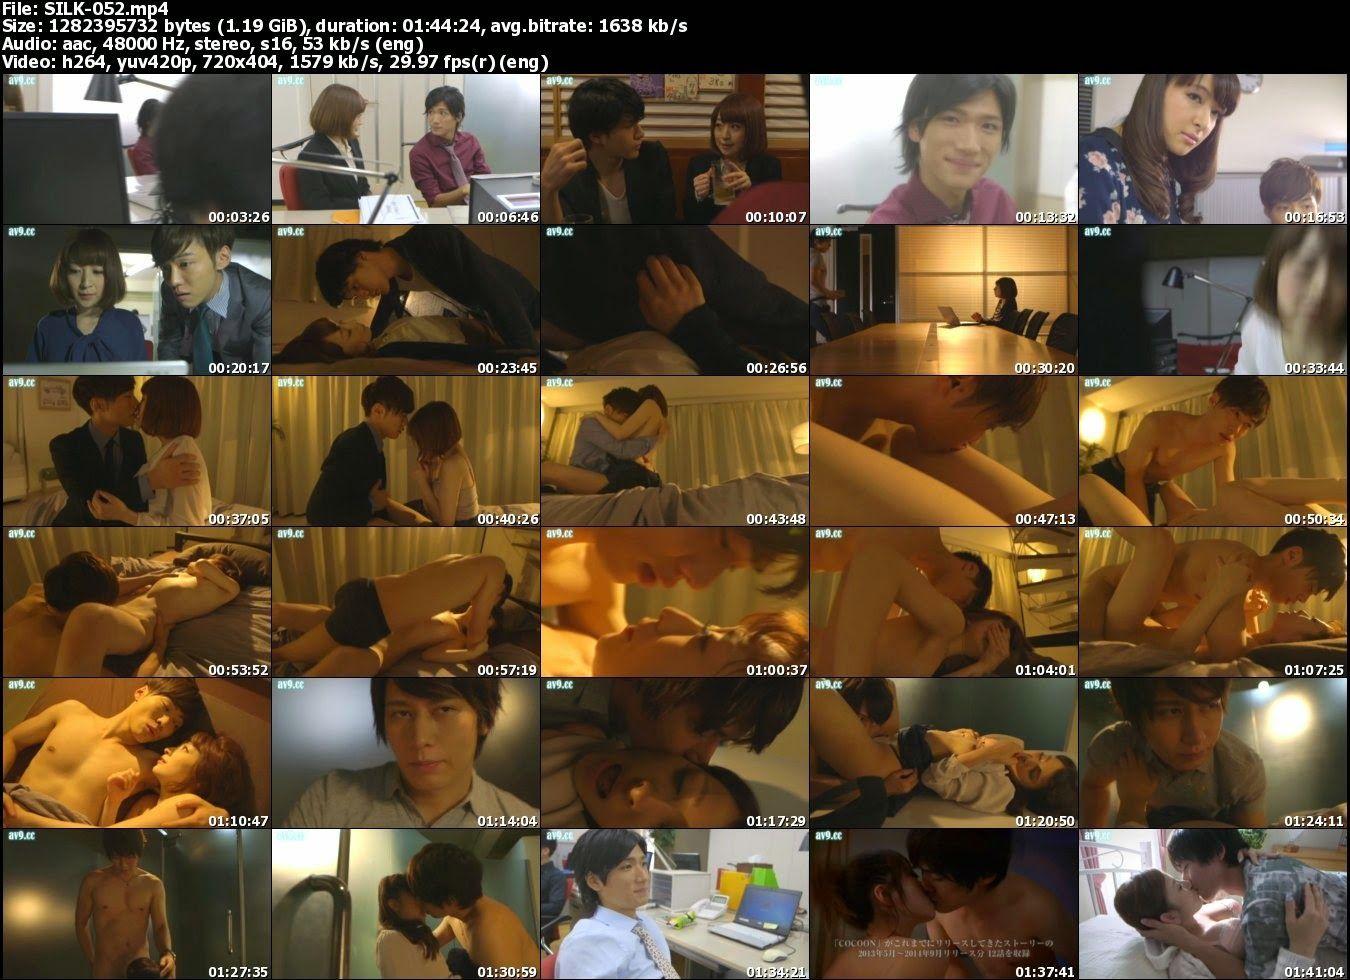 Jav Silk 052 Ninomiya Nana Asuka Mimi